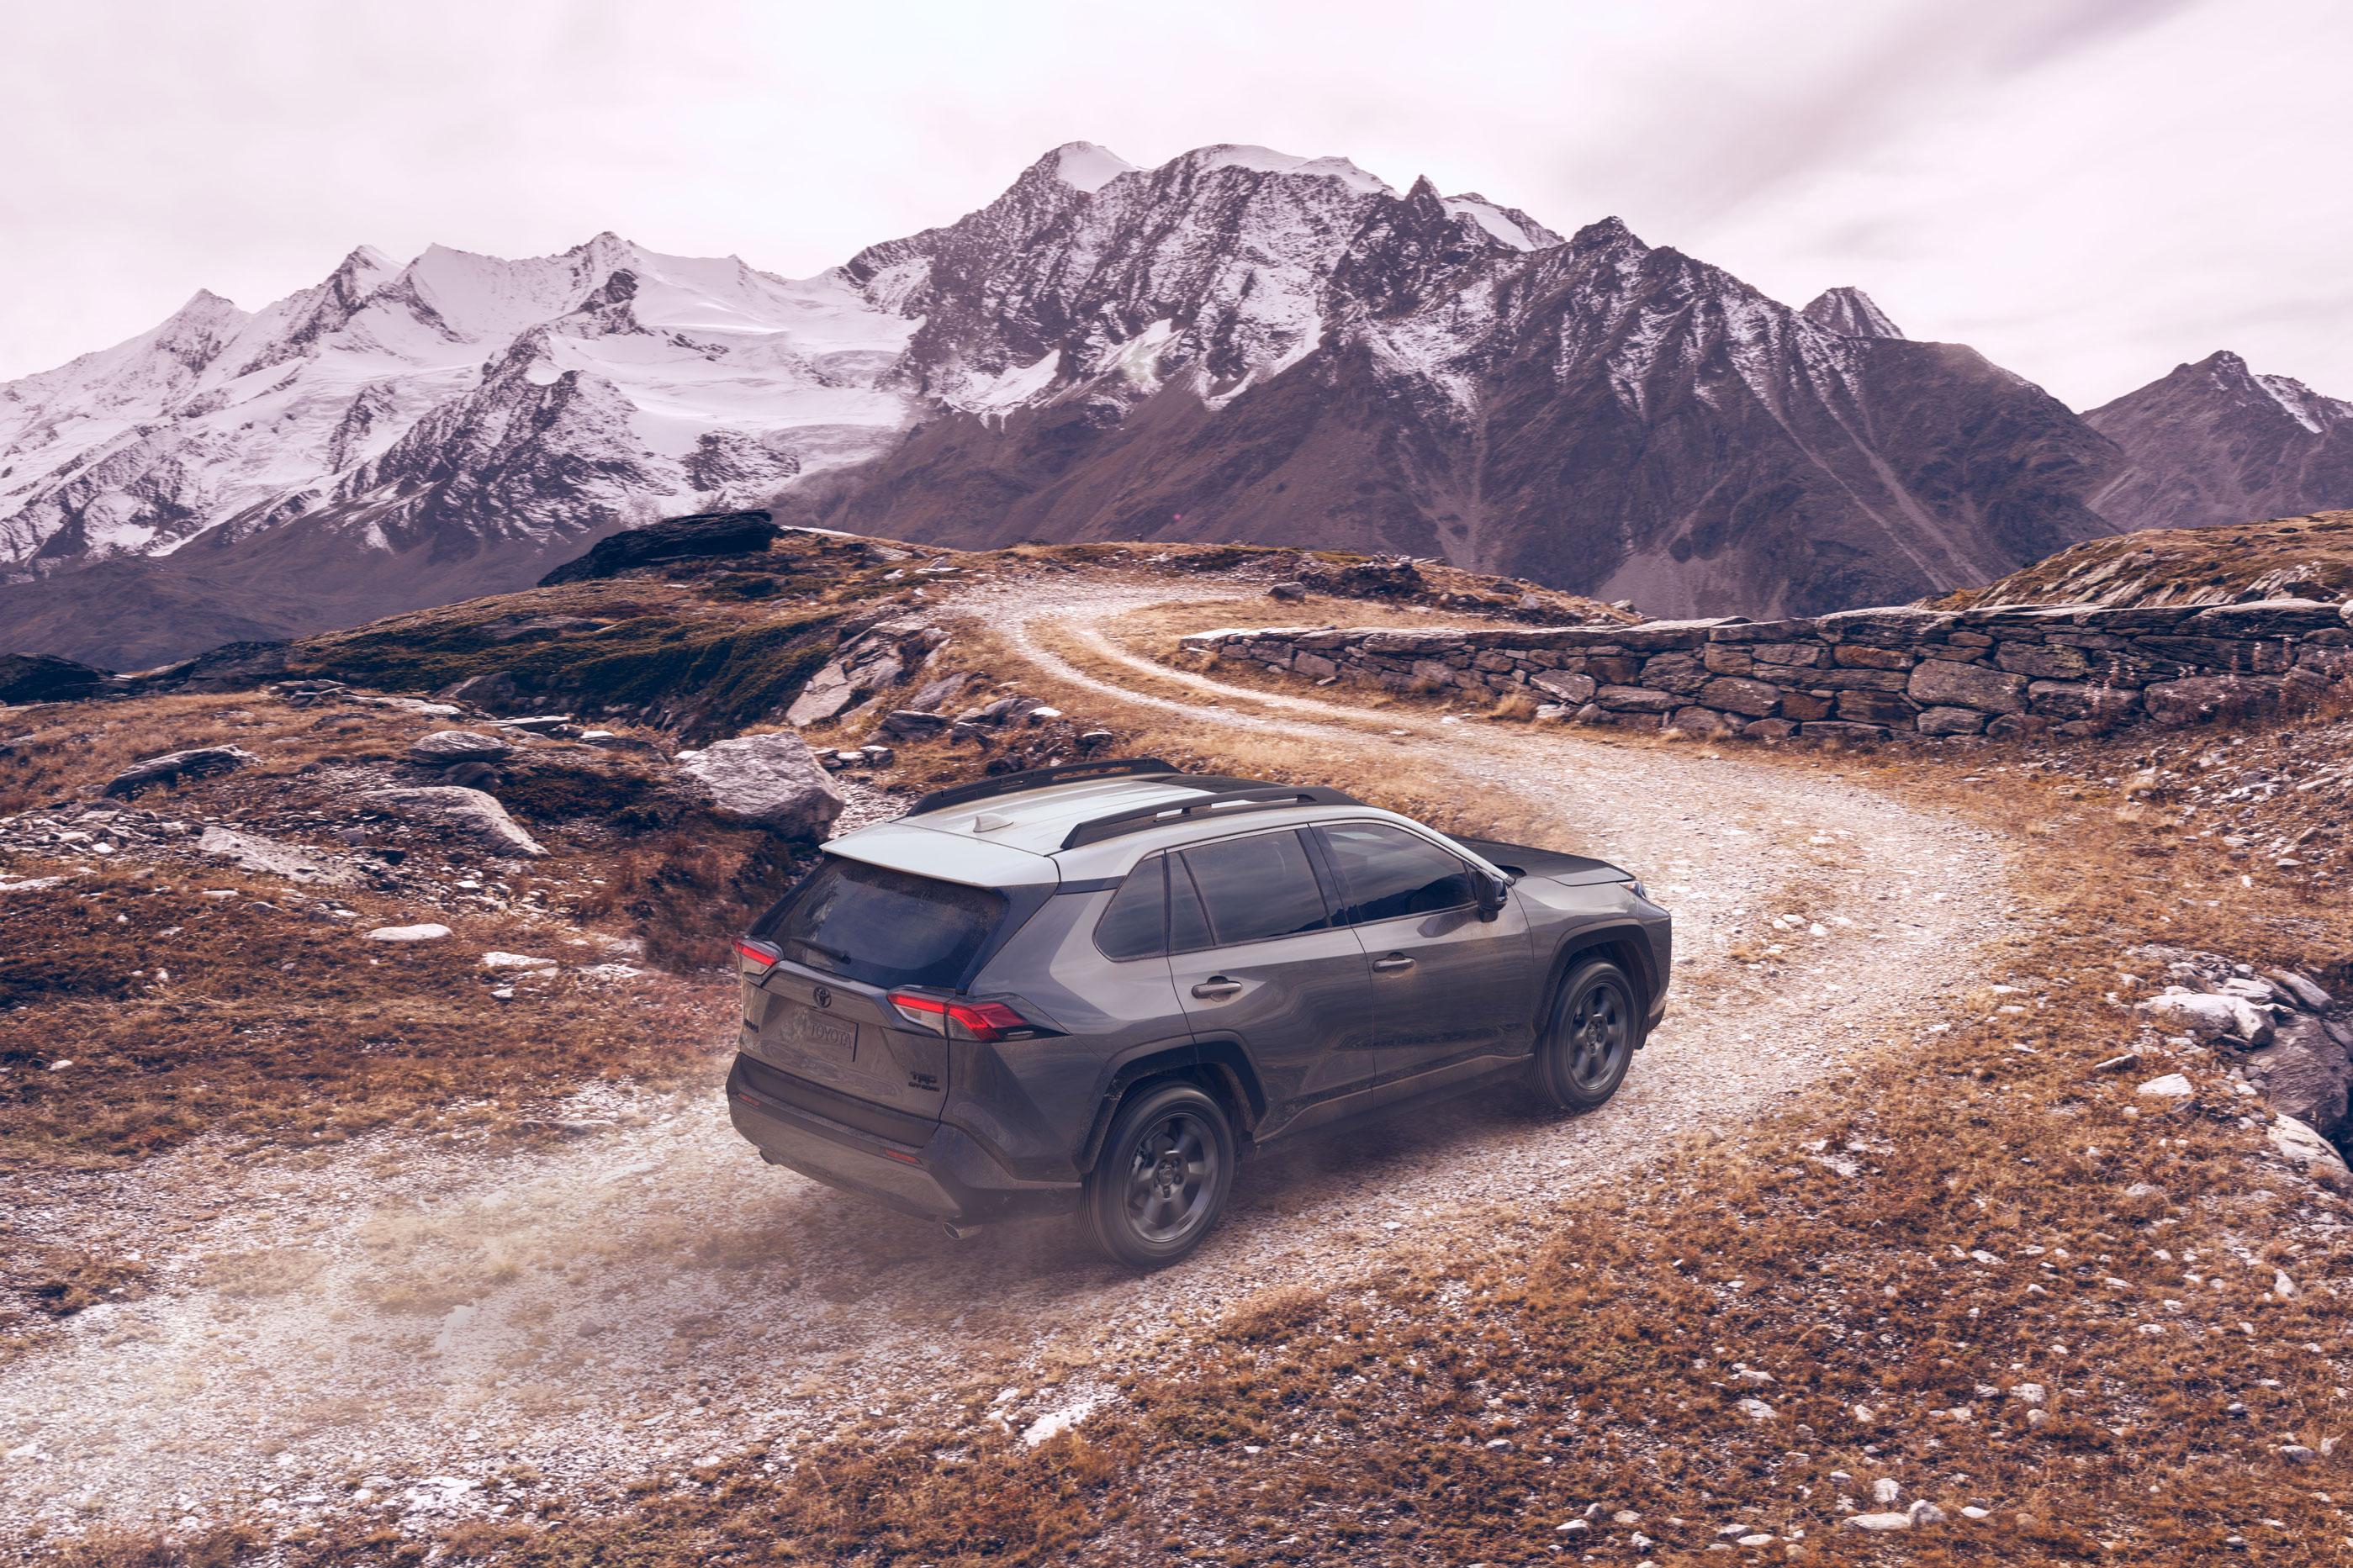 2020 Toyota RAV4 TRD Off-Road on winding mountain road